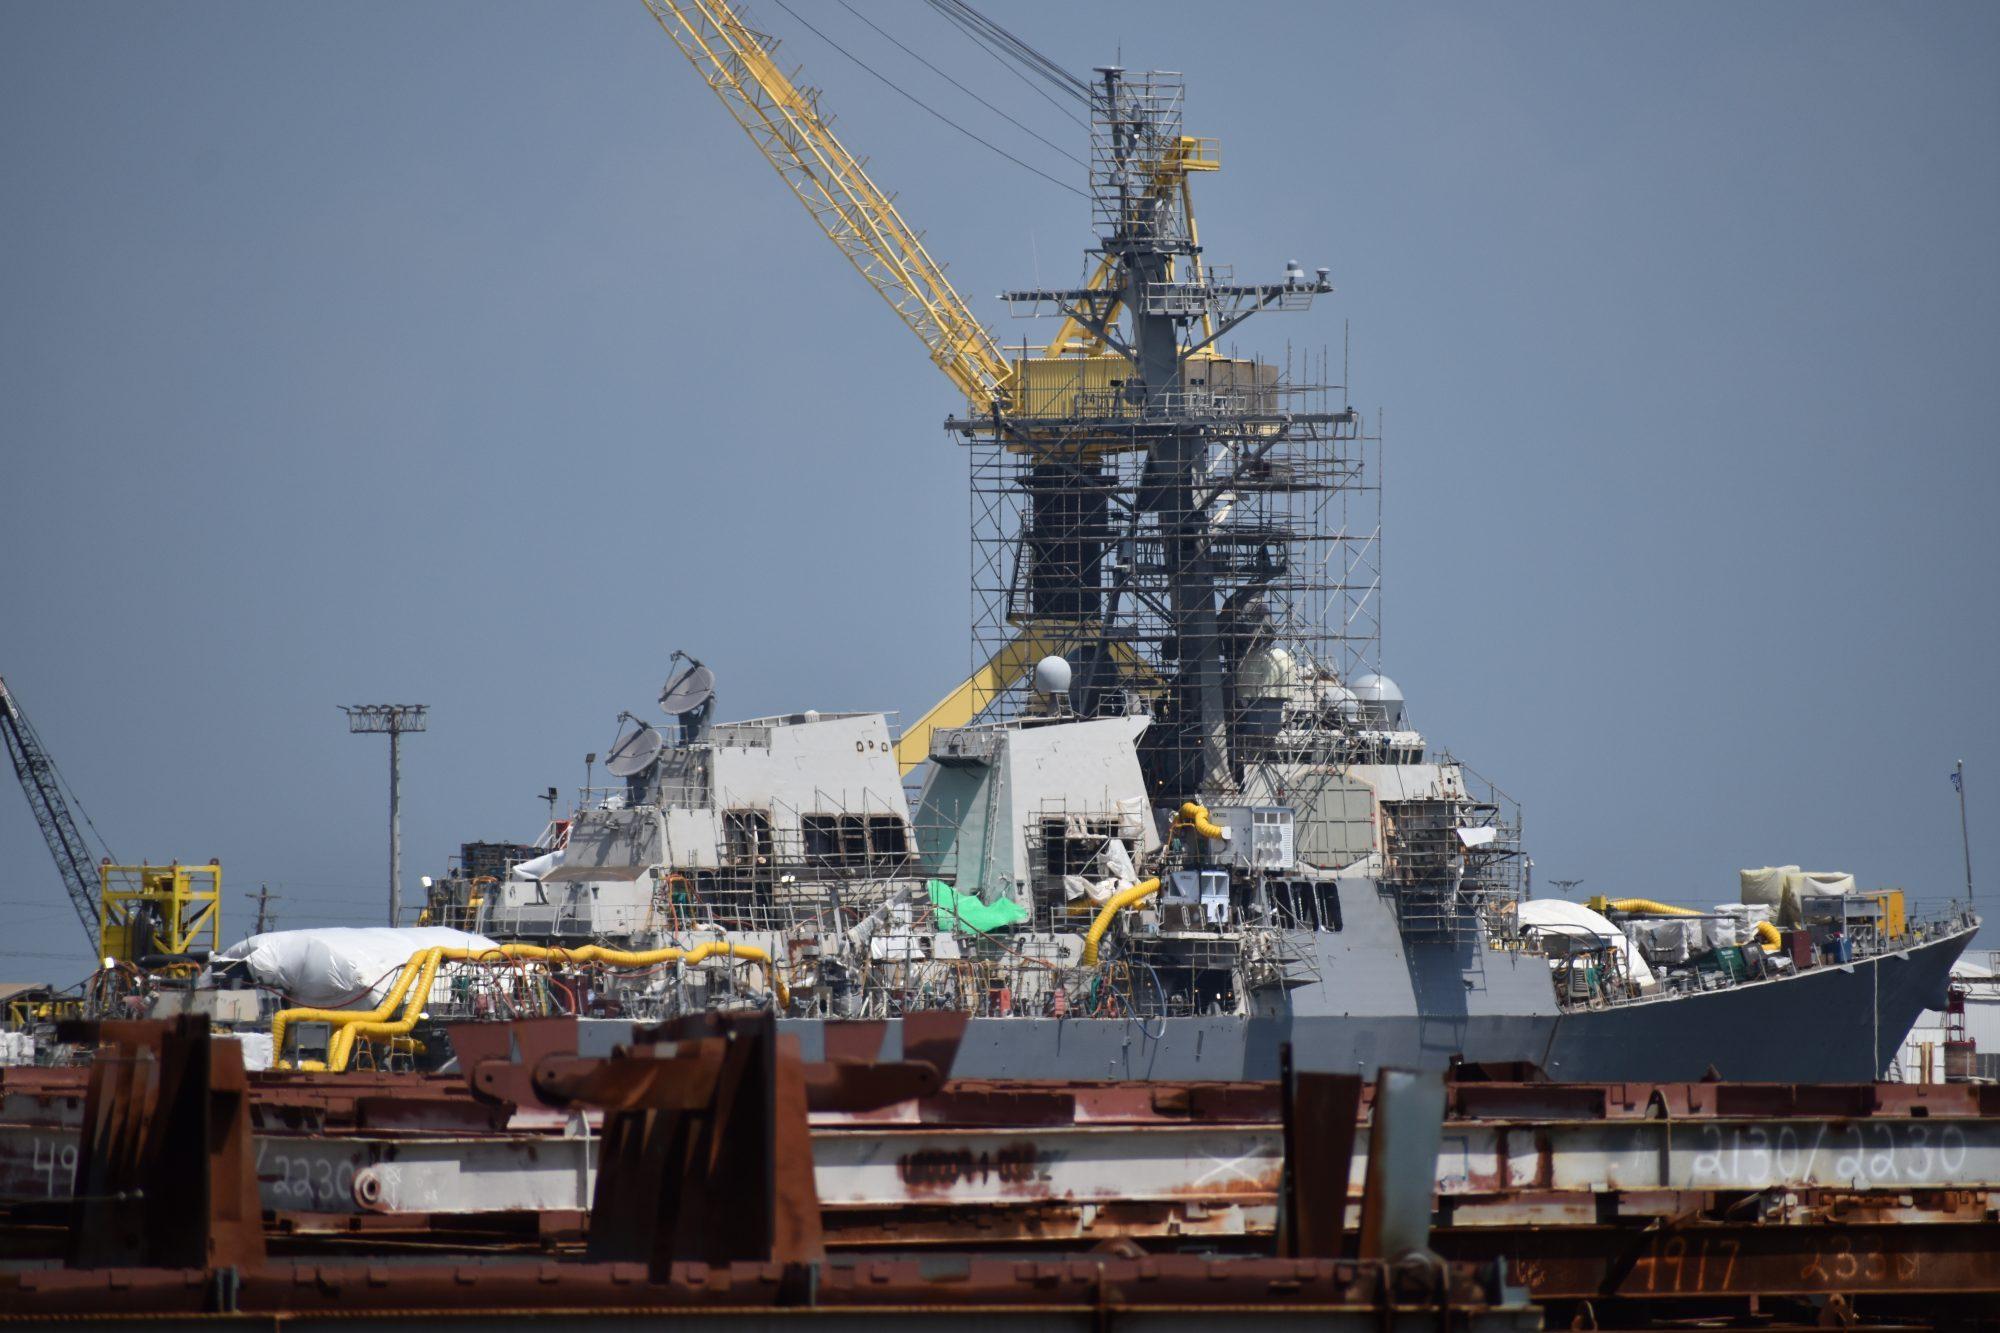 USS Fitzgerald (DDG 62) under repair Ingalls West Bank Pascagoula River July 2019 eger (2)